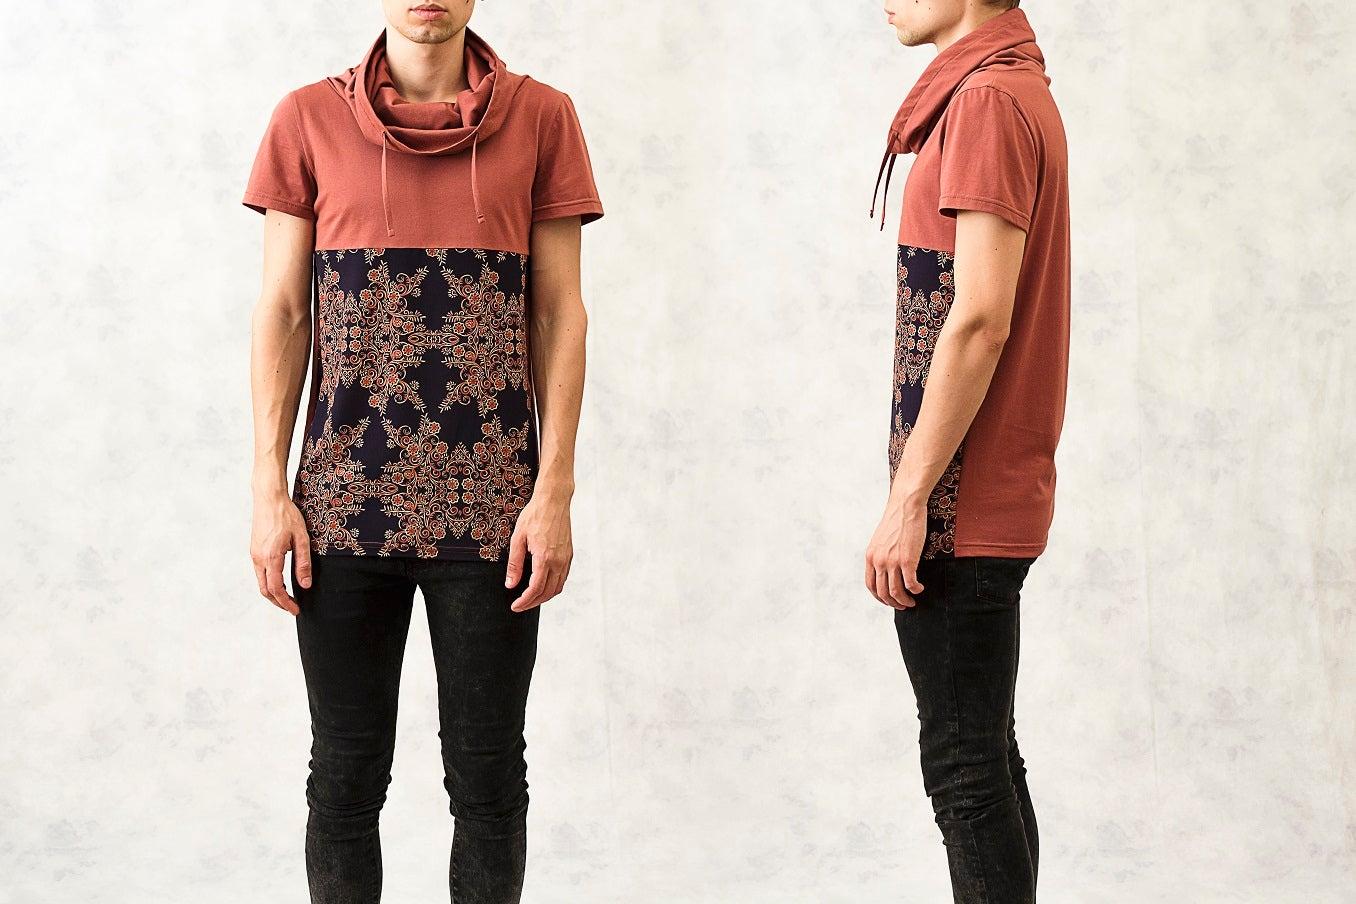 Image of Printed Drawstring Polo-Neck Cotton T-Shirt